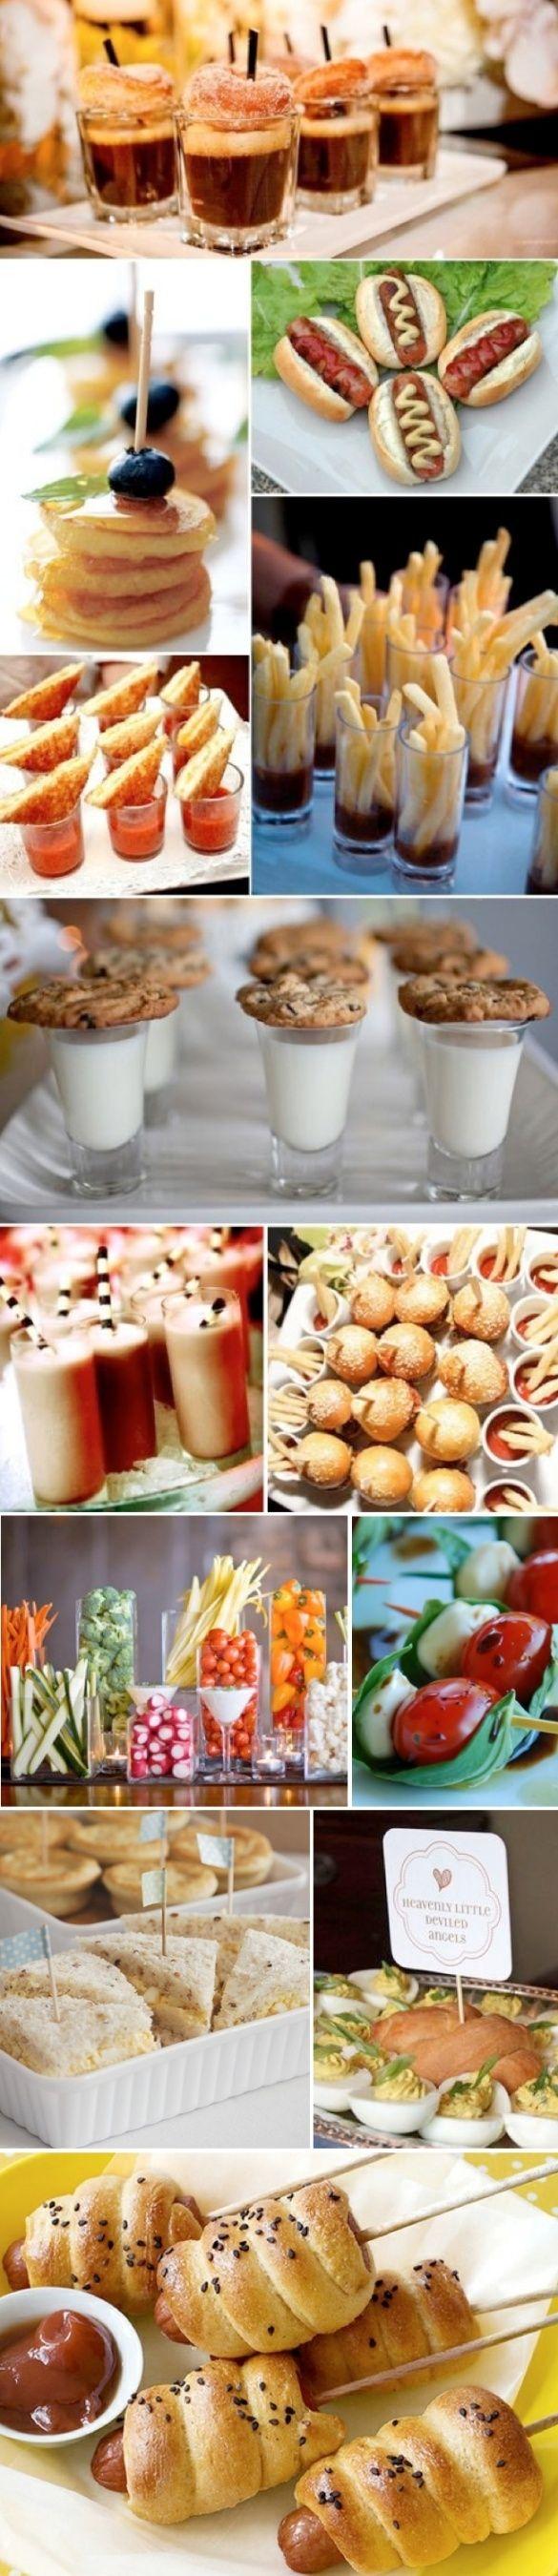 finger foods by Debra Bryfogle